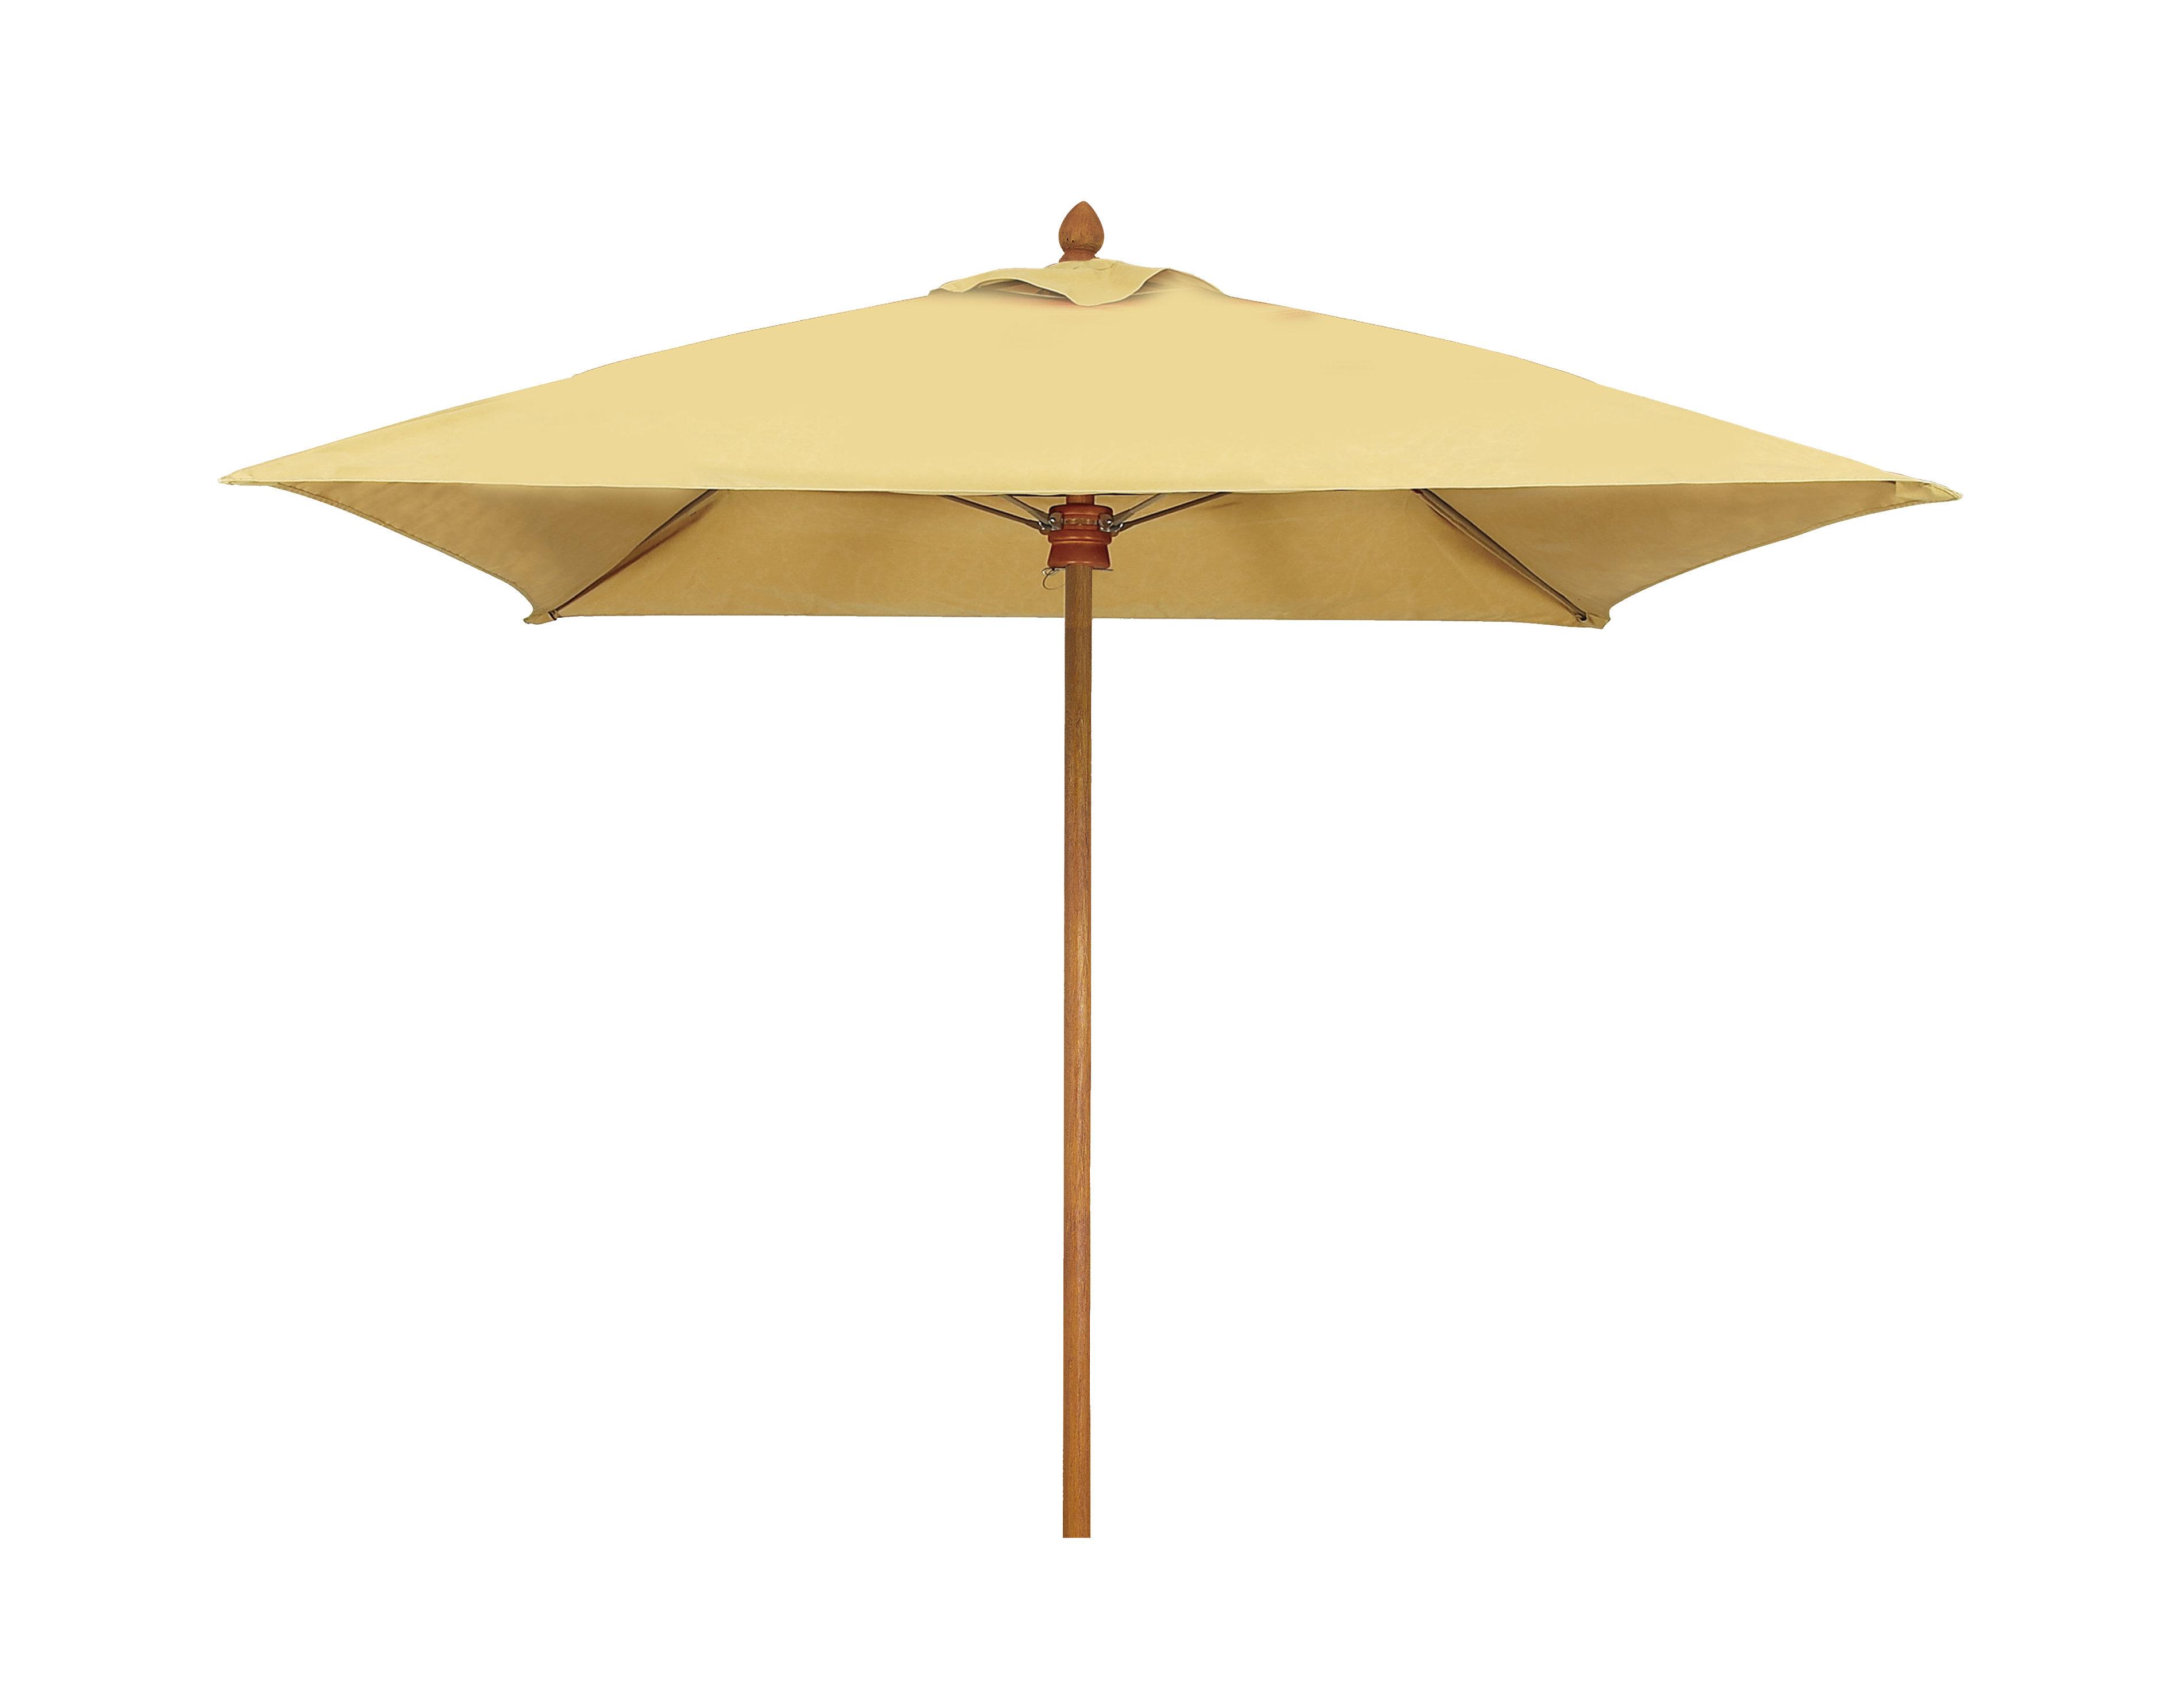 2020 Prestige 6' Square Market Umbrella Throughout Priscilla Market Umbrellas (View 9 of 20)